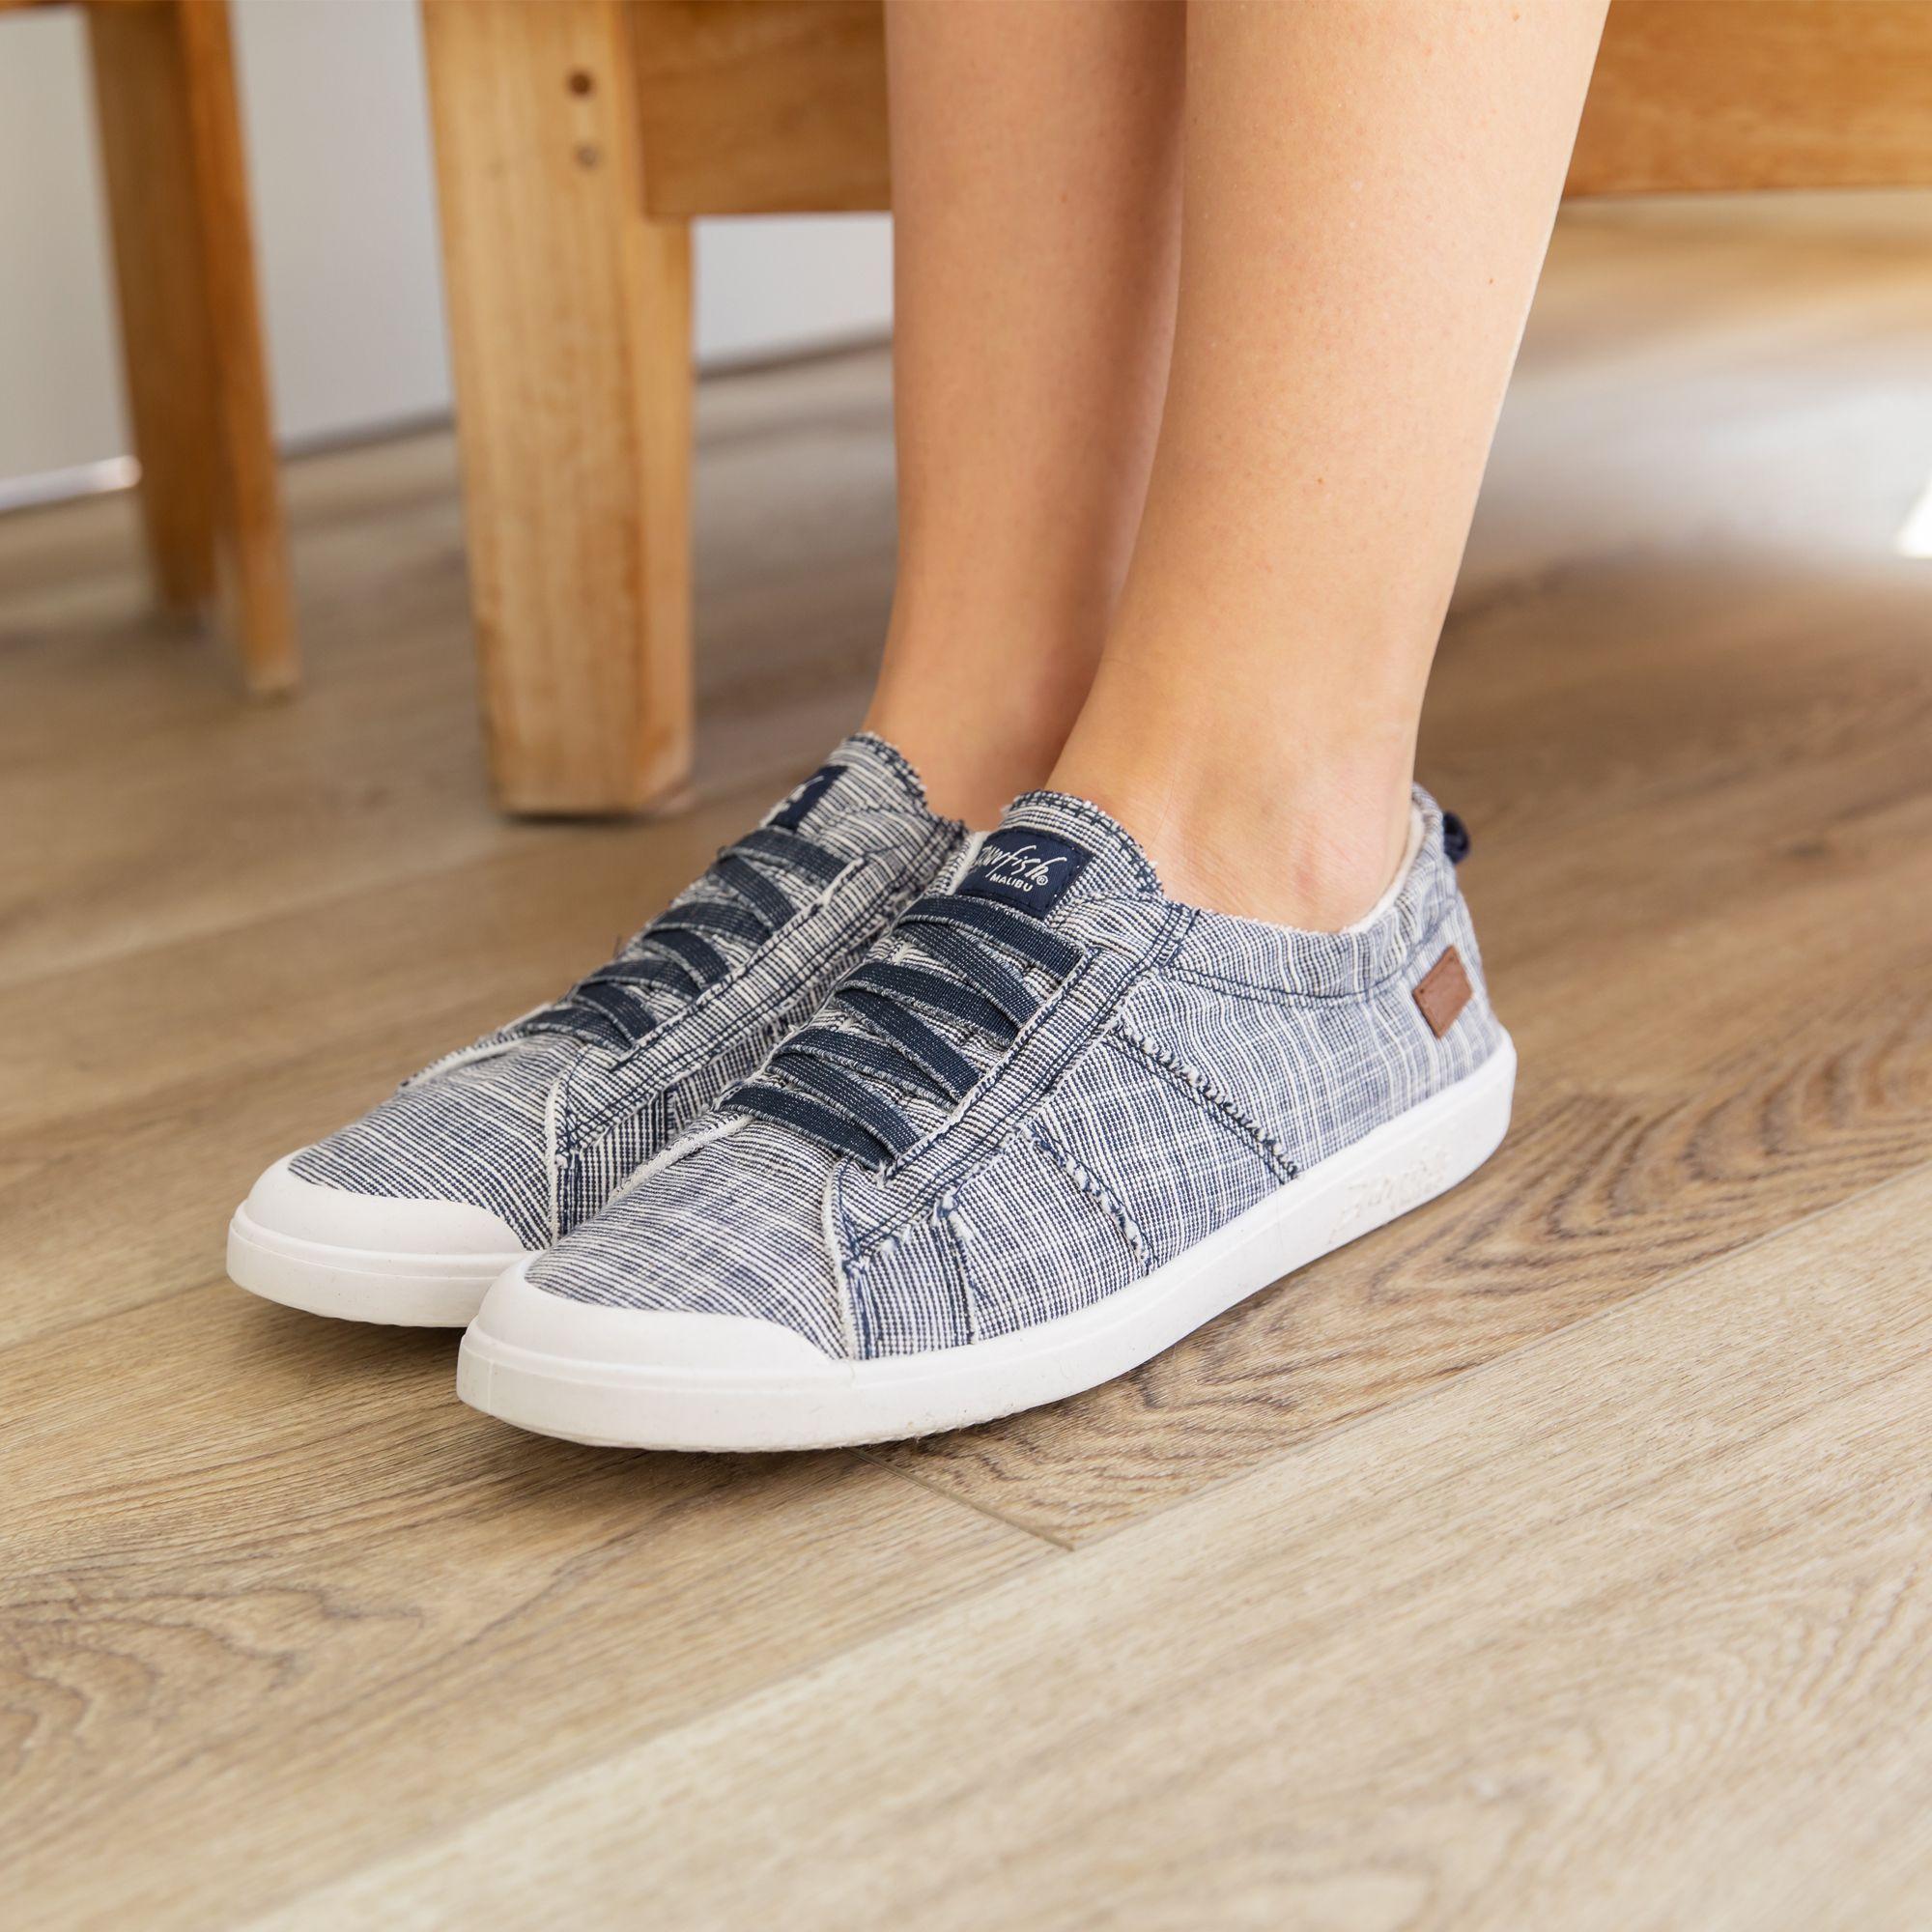 Blowfish, Elastic laces, Sneakers